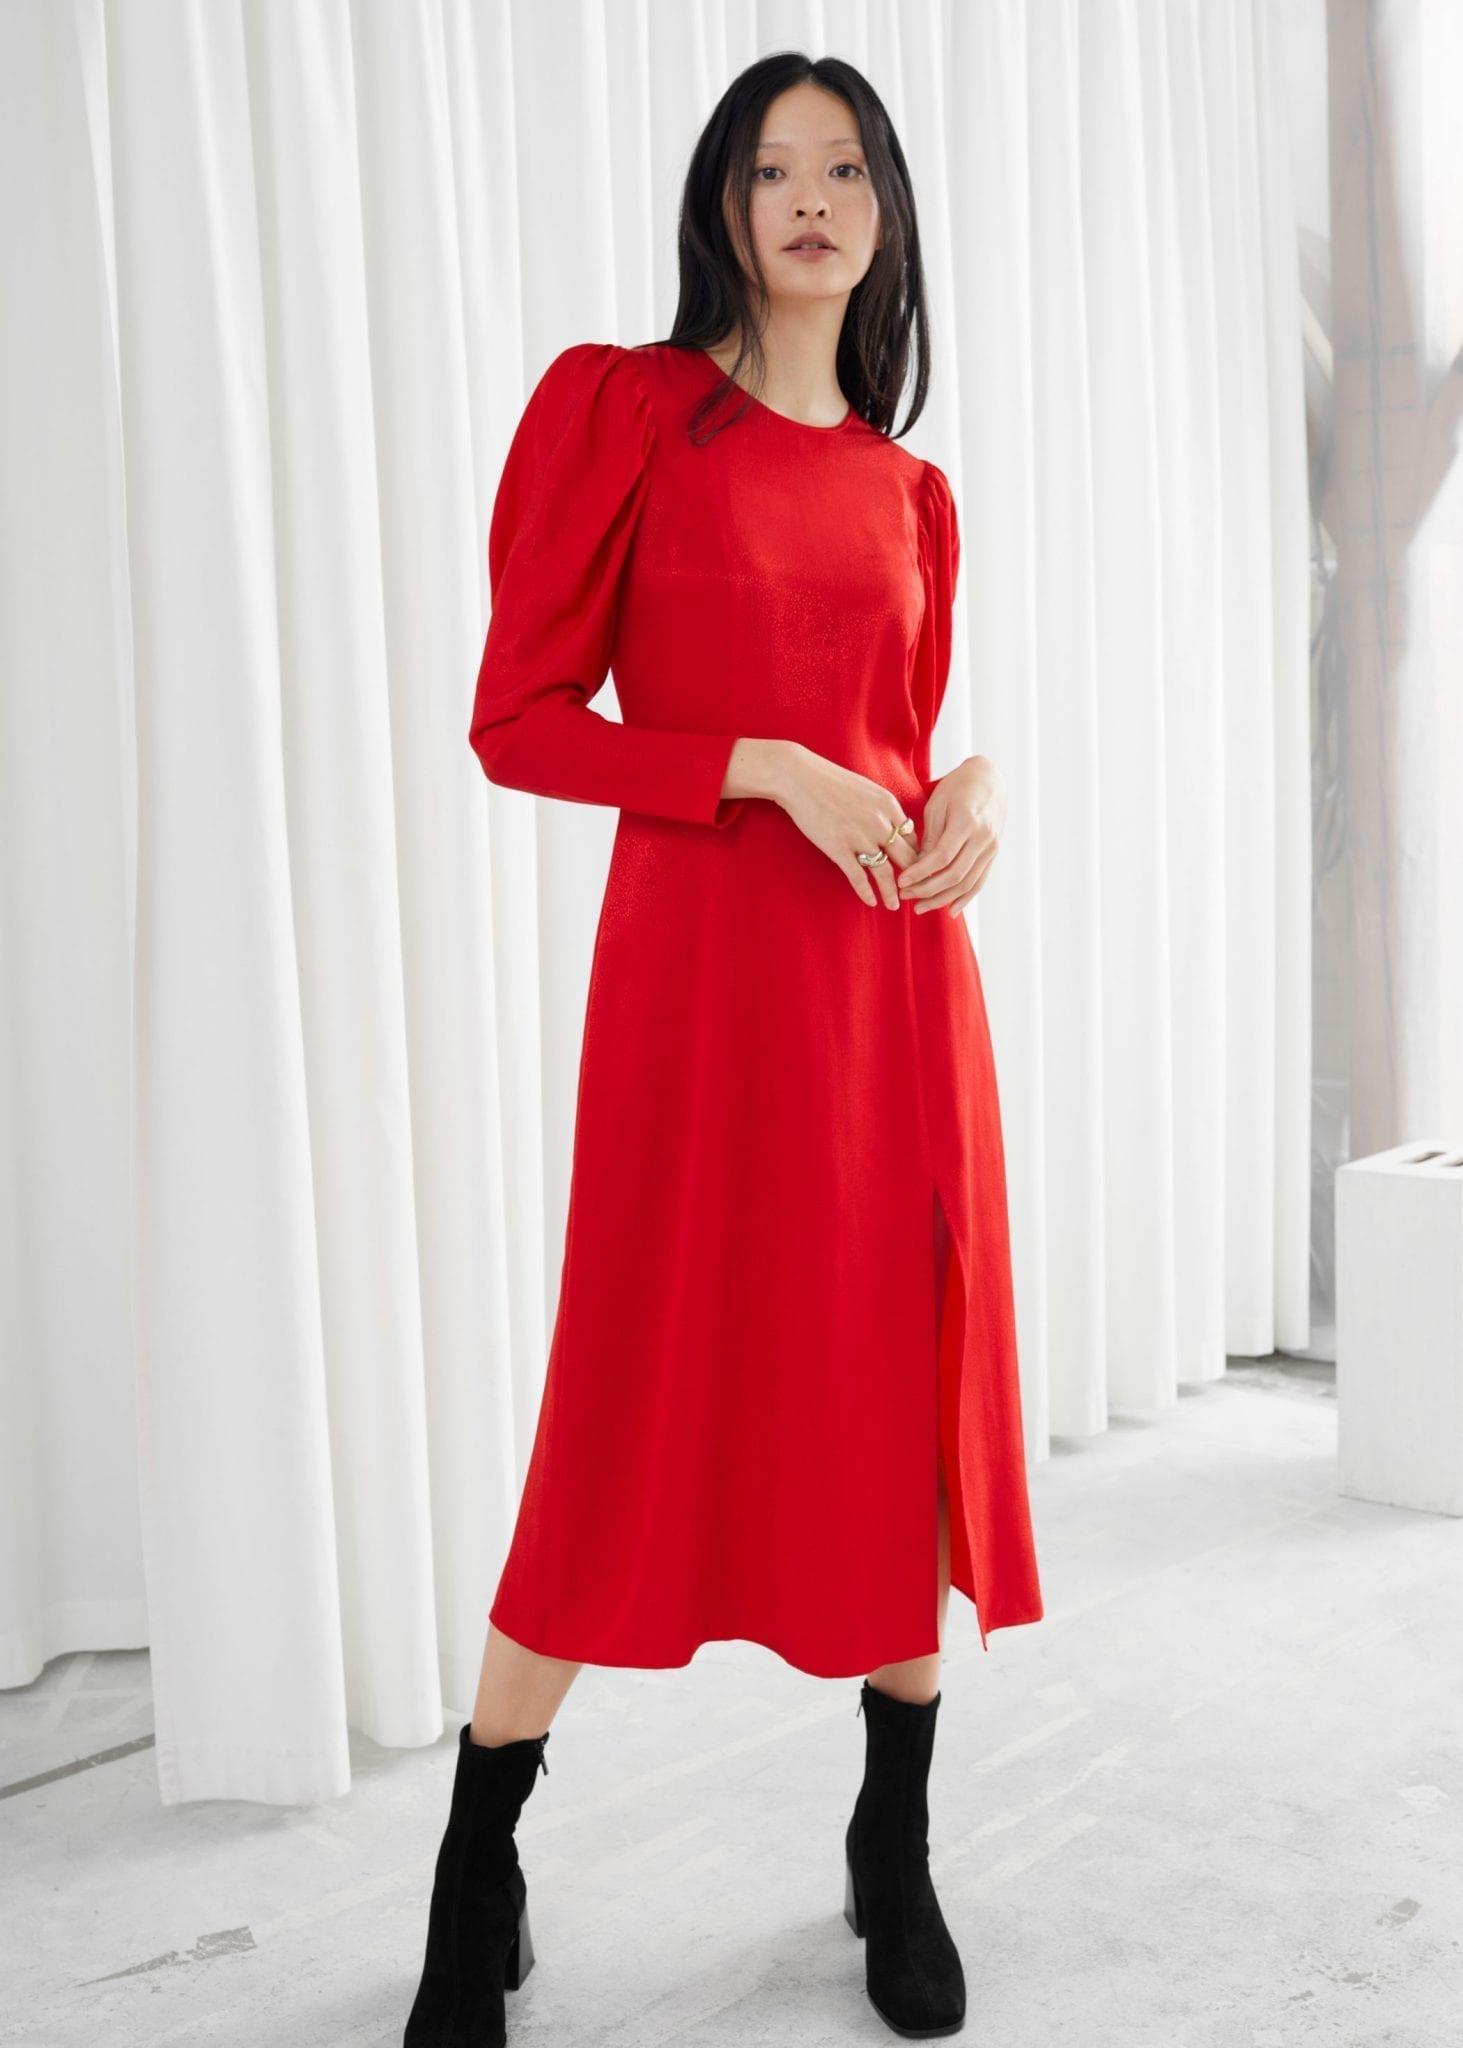 & OTHER STORIES Jacquard Puff Sleeve Midi Slit Dress